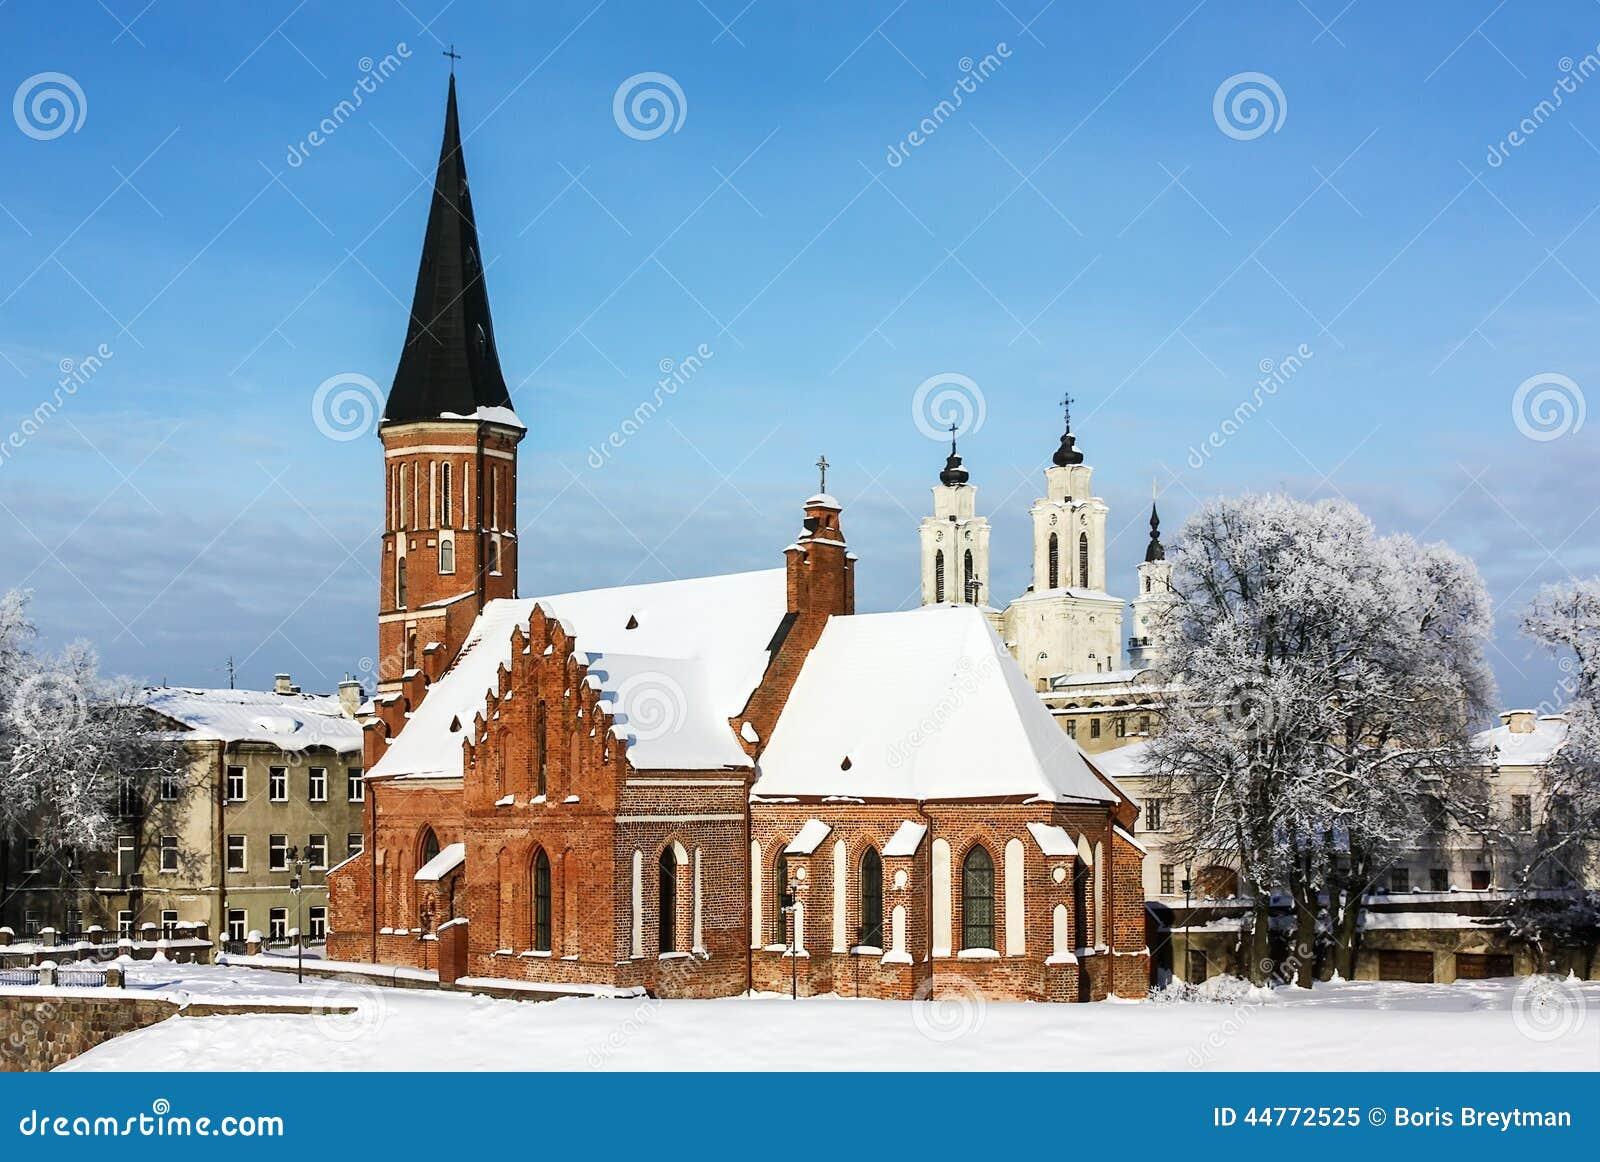 Vytautas the Great Church, Kaunas